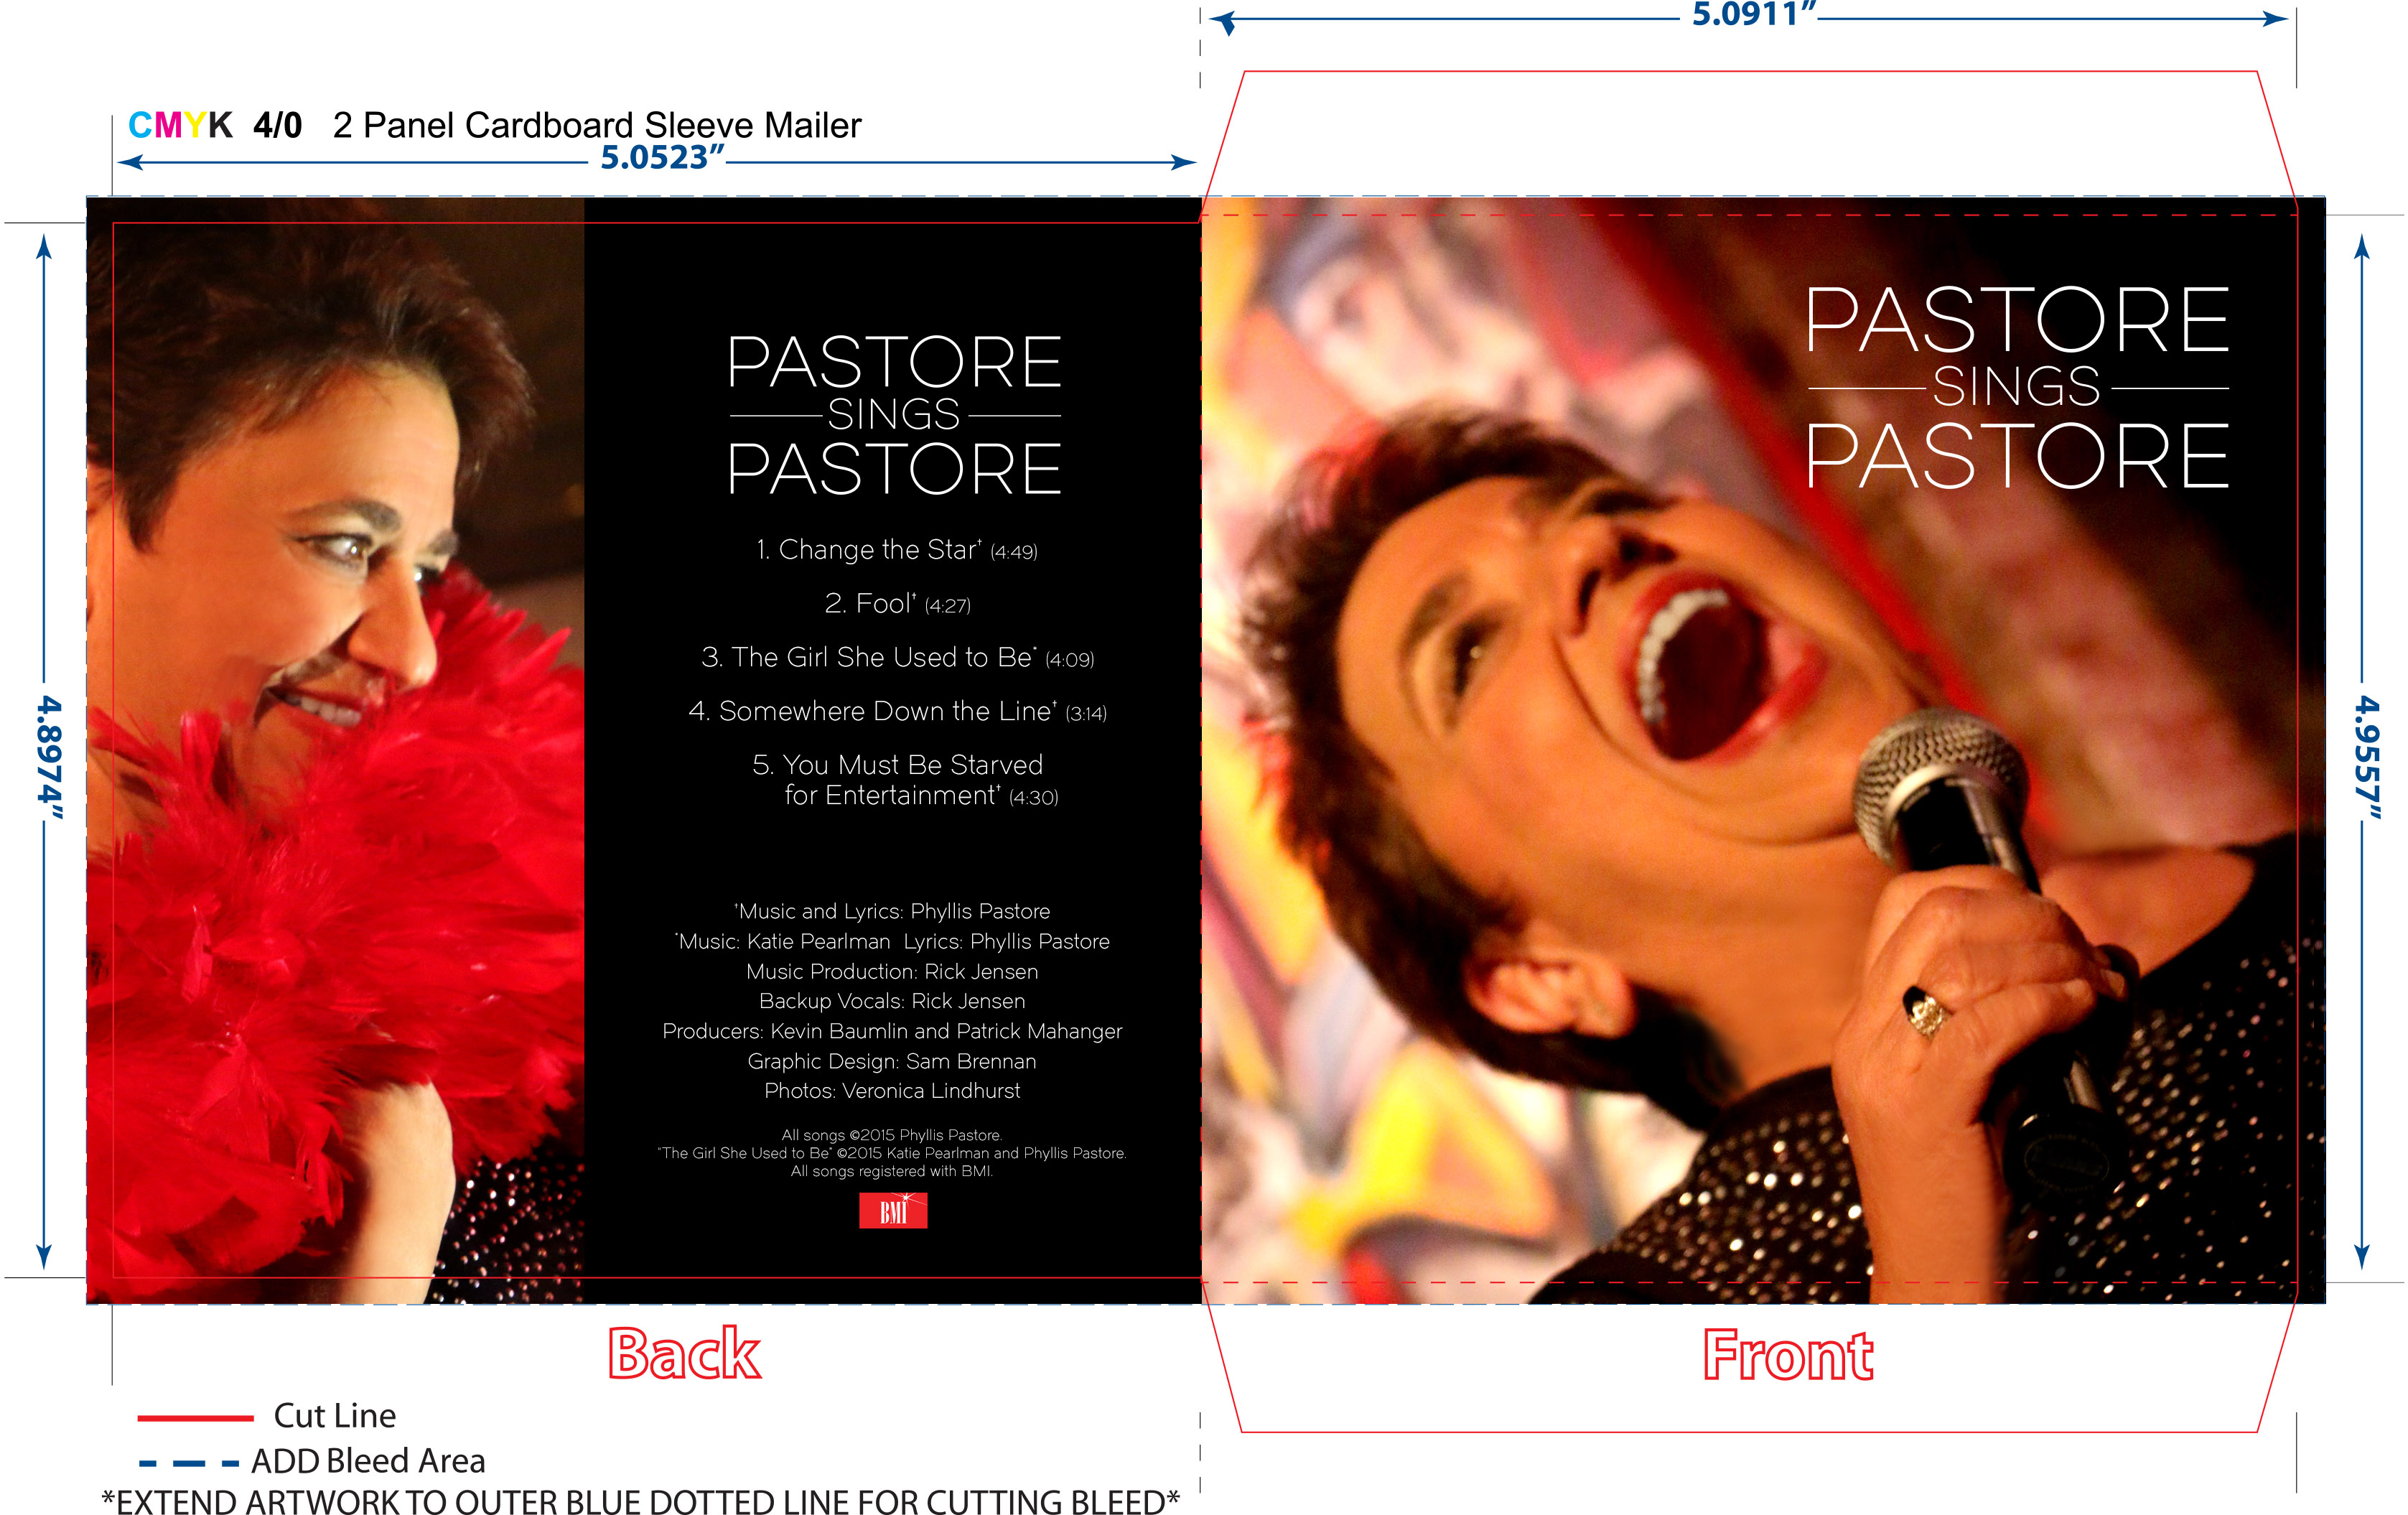 Pastore Sings Pastore